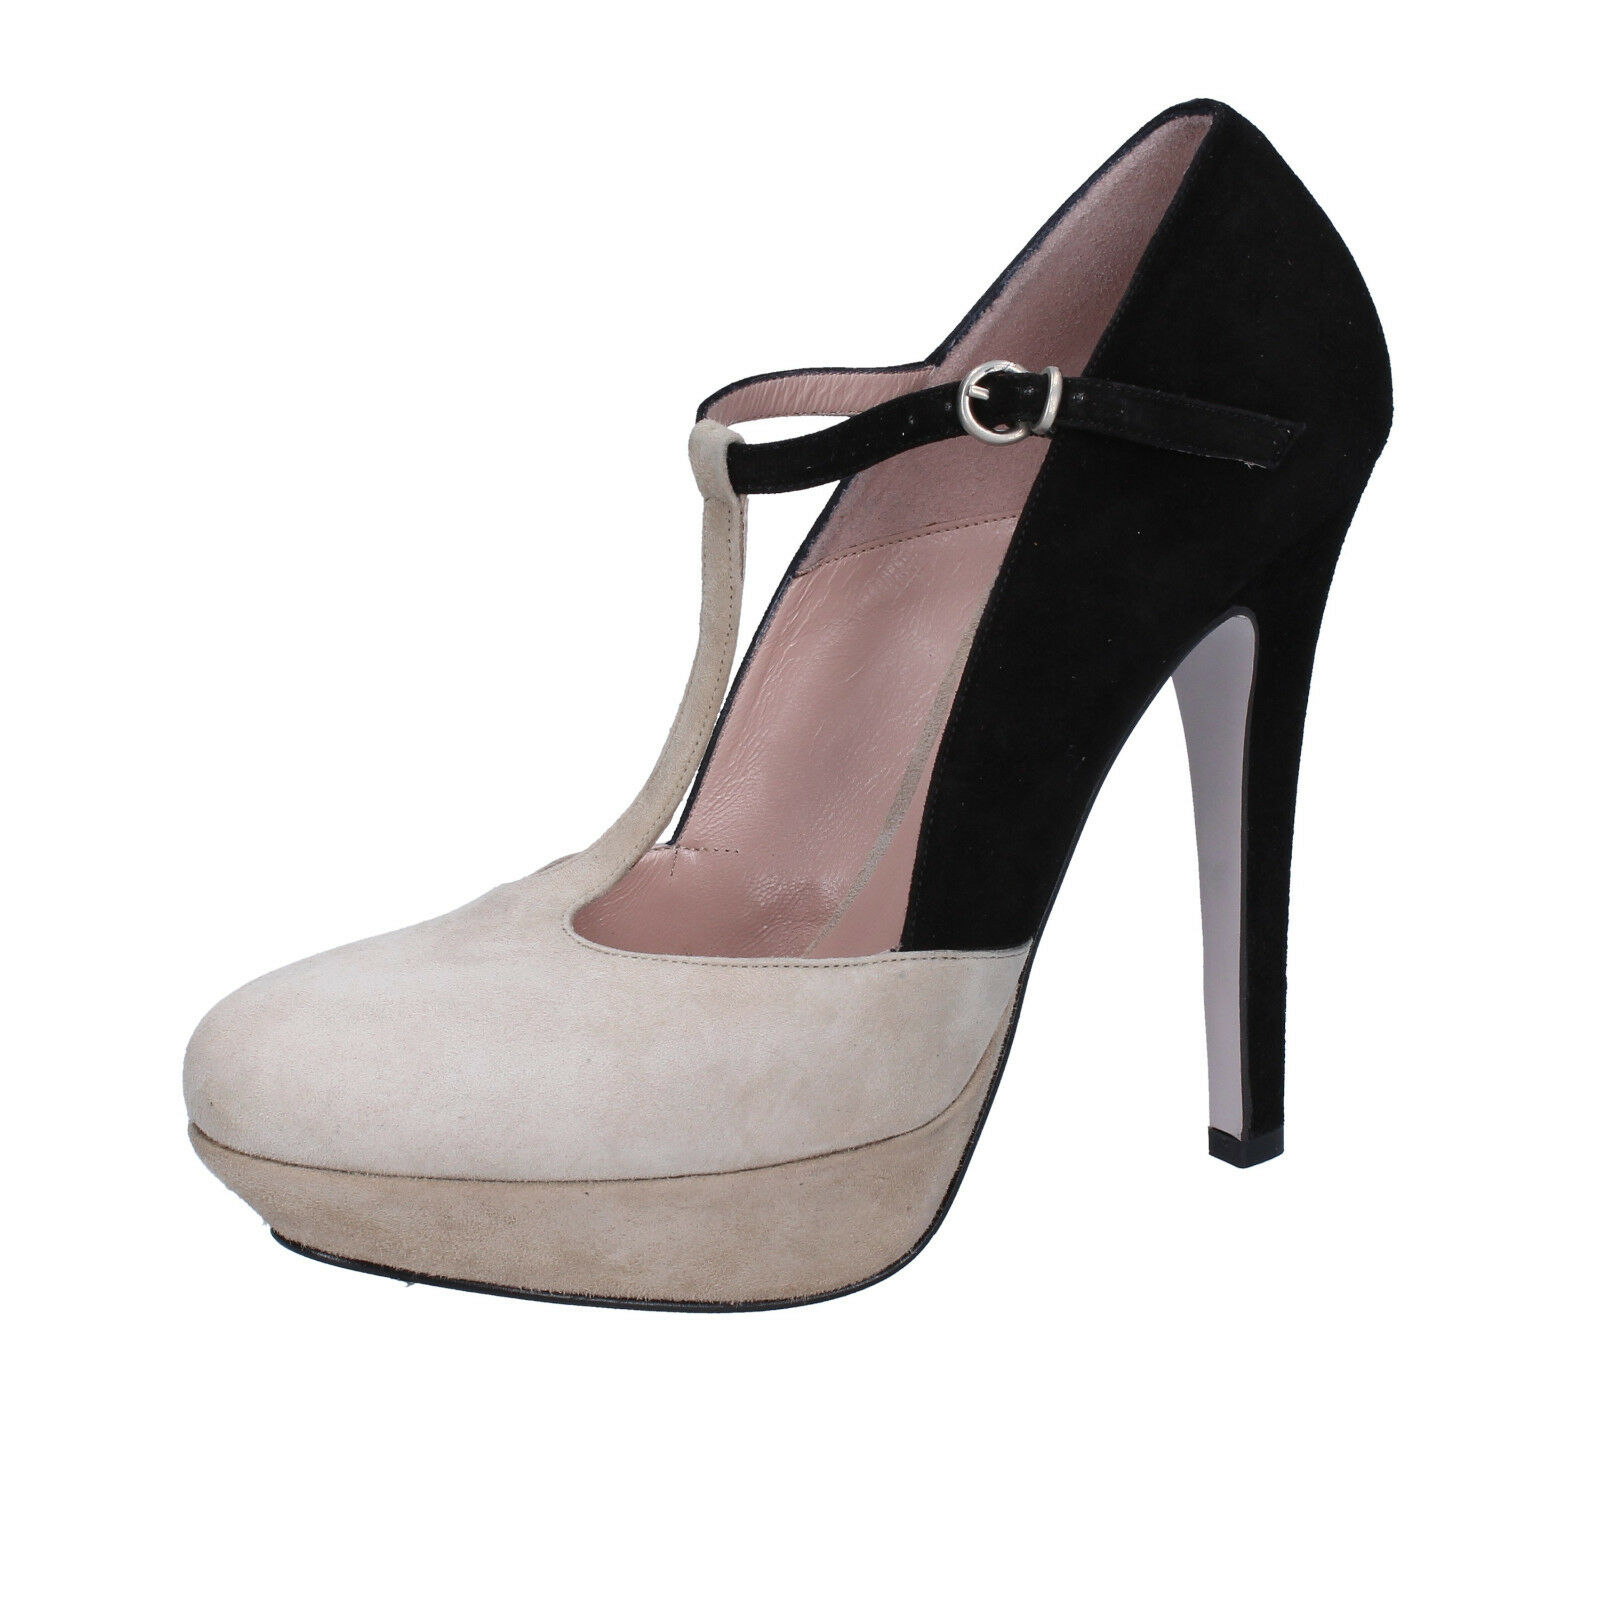 Chaussures Femmes 25.1 C UE 38,5 escarpins noir beige daim ah295-38, 5